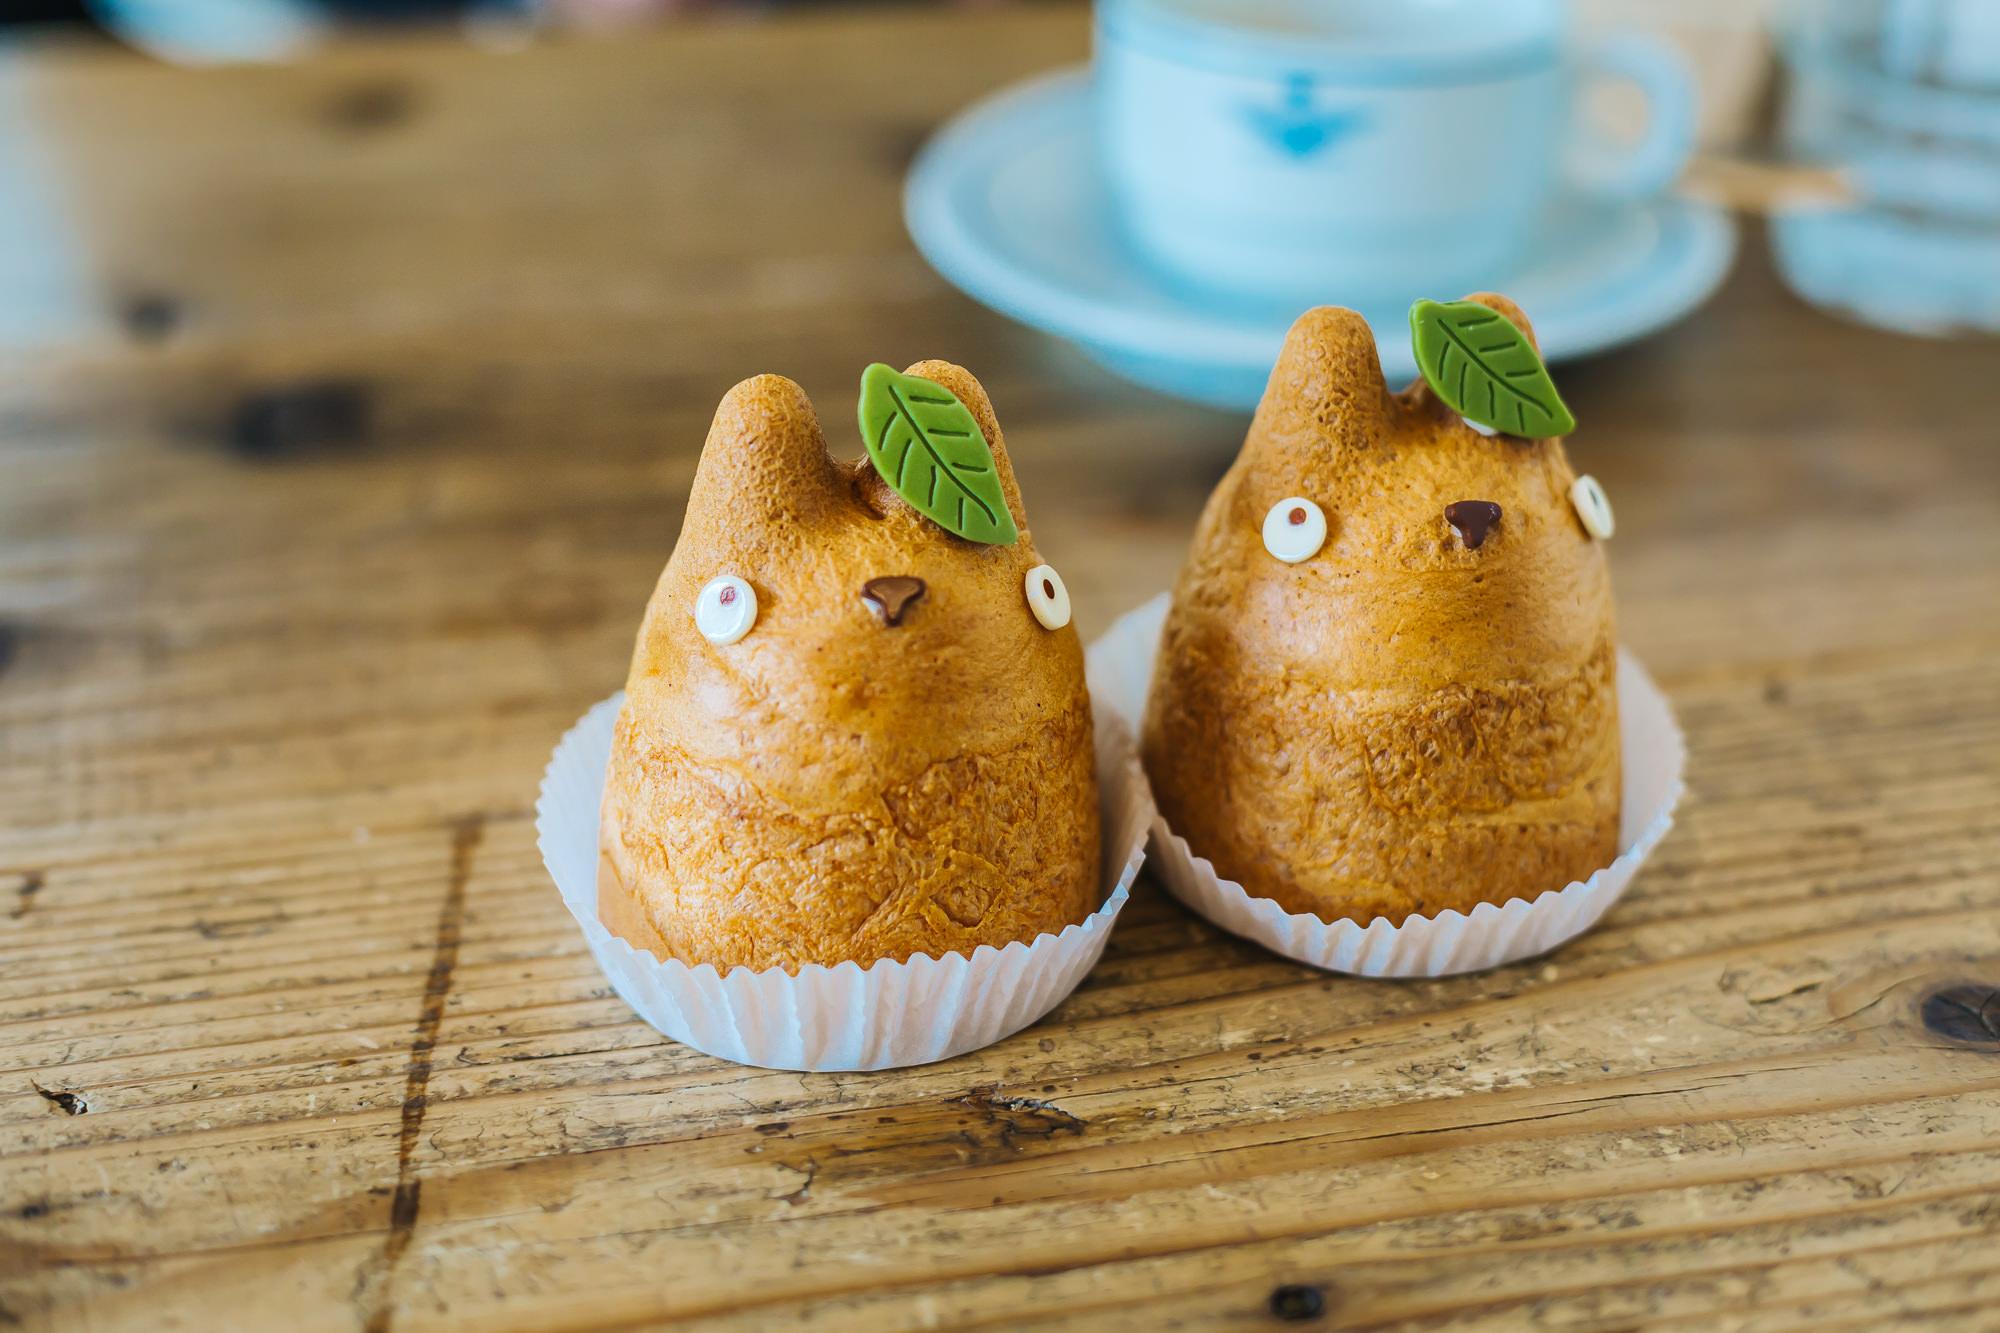 Totoro cream puffs - so cute!